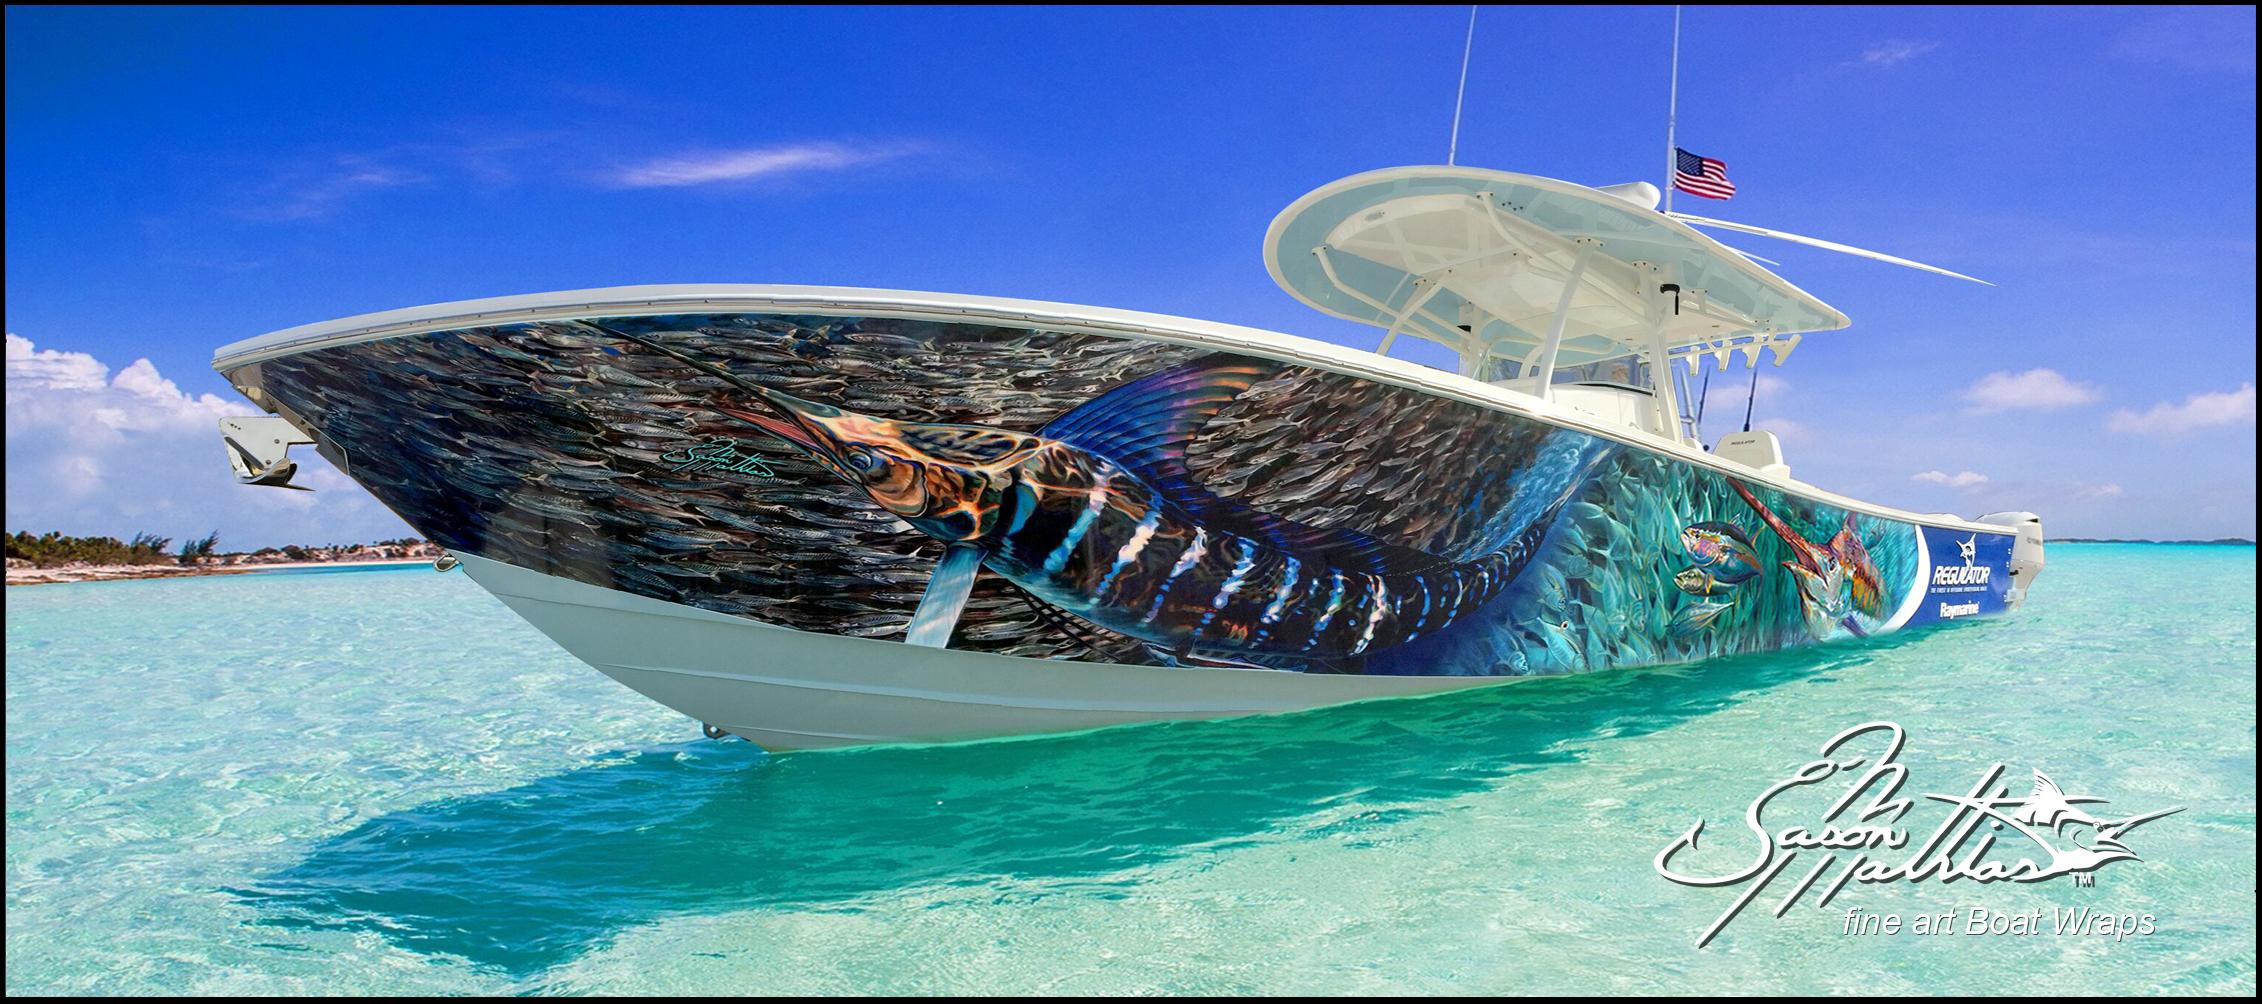 boat-wraps-boat-wrap-desings-marlin-art-jason-mathias-sportfish-fihsing-gamefish.jpg